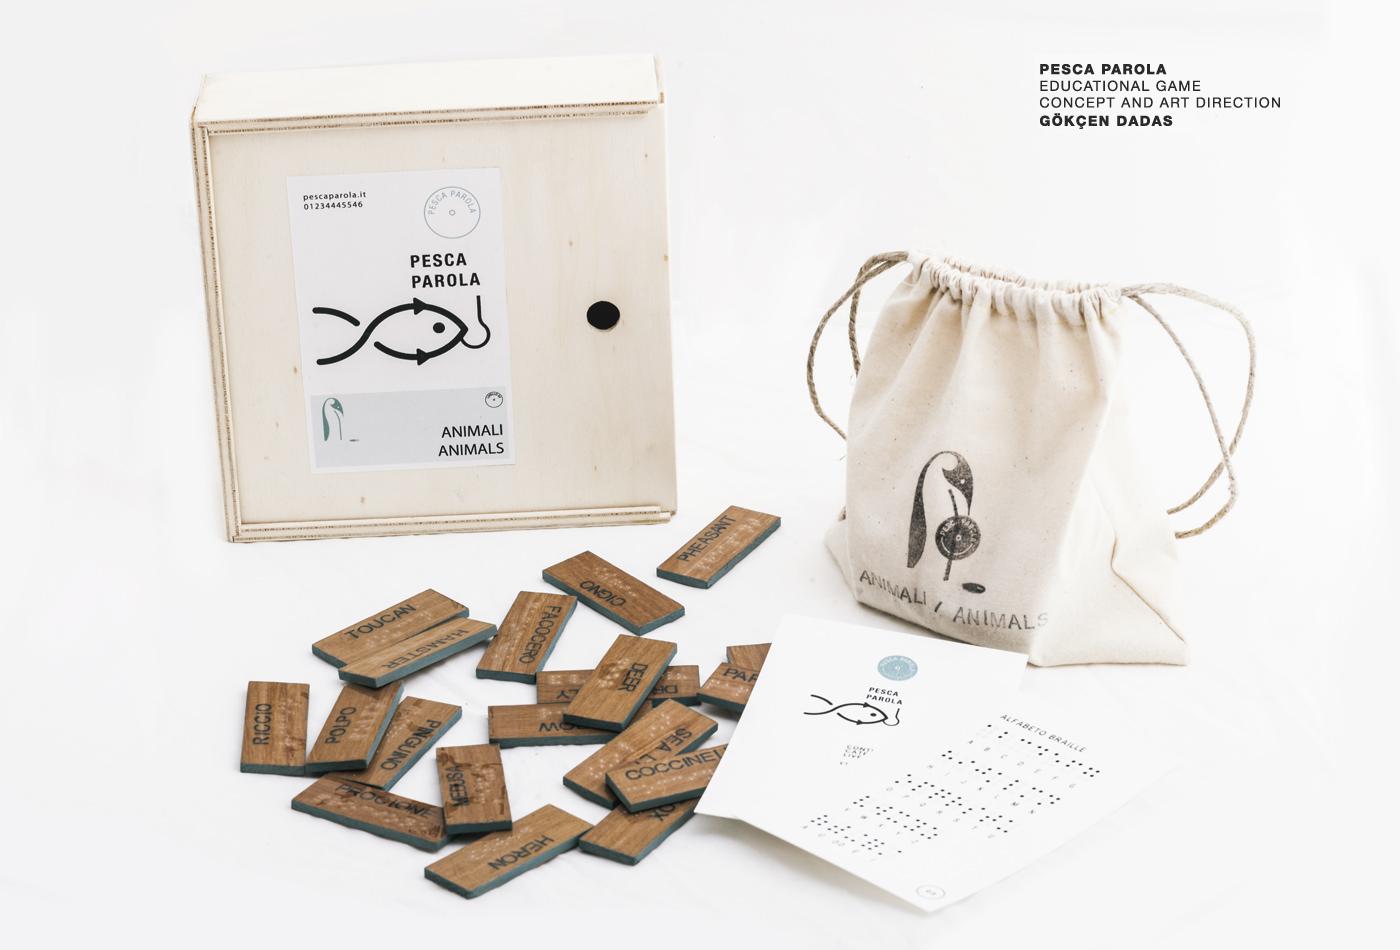 pesca-parola-educational-learn-education-woodtoys-block-vacaliebres-gokcen-dadas-